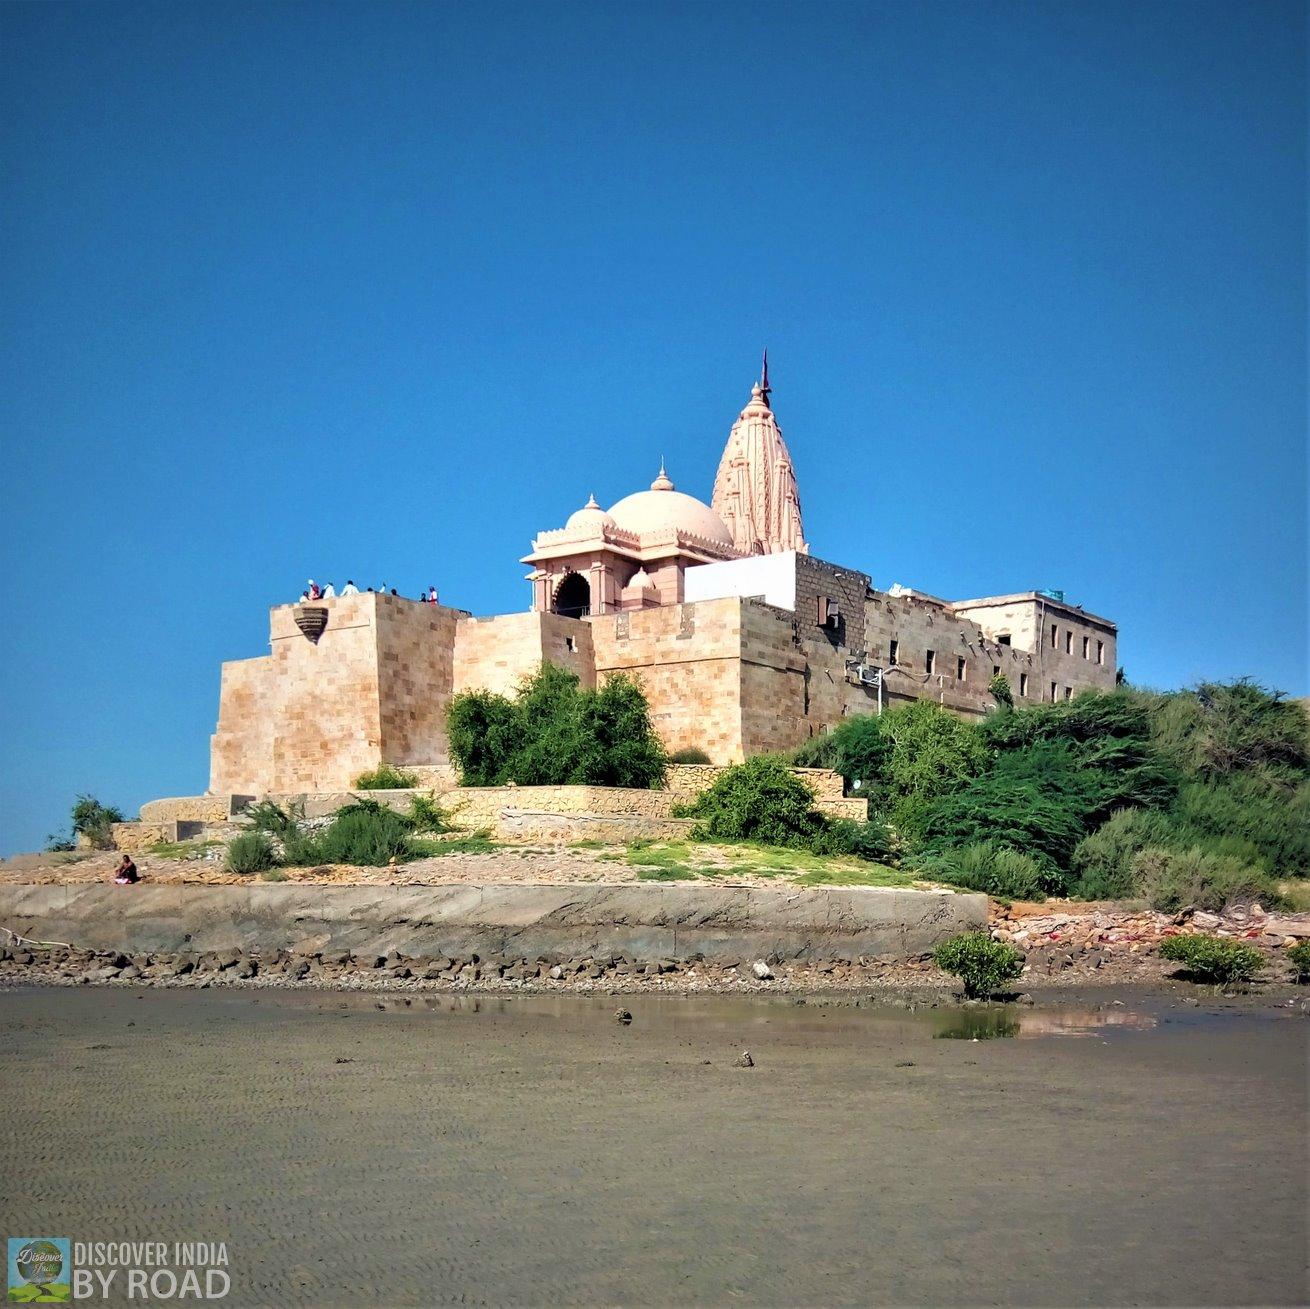 View of Koteshwar Mahadev temple from Seashore